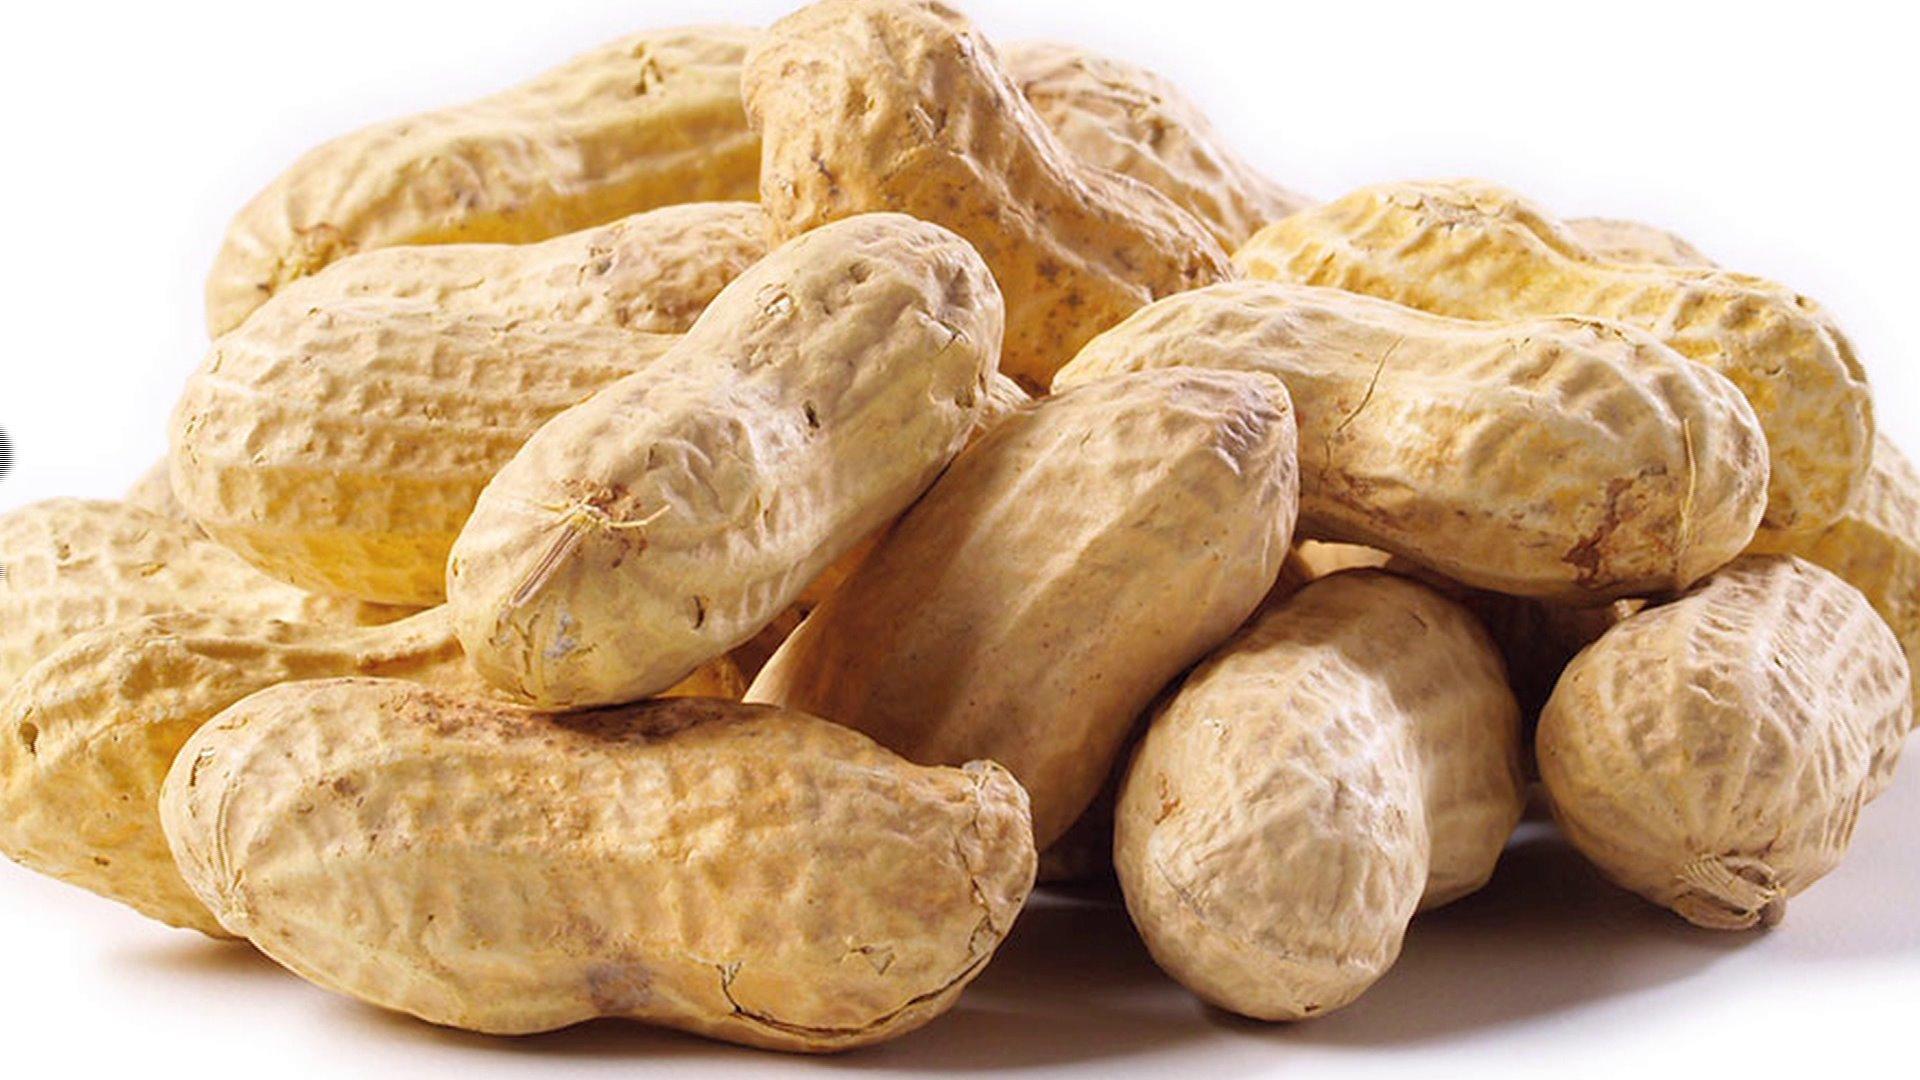 Khasiat dan Manfaat Kacang Tanah